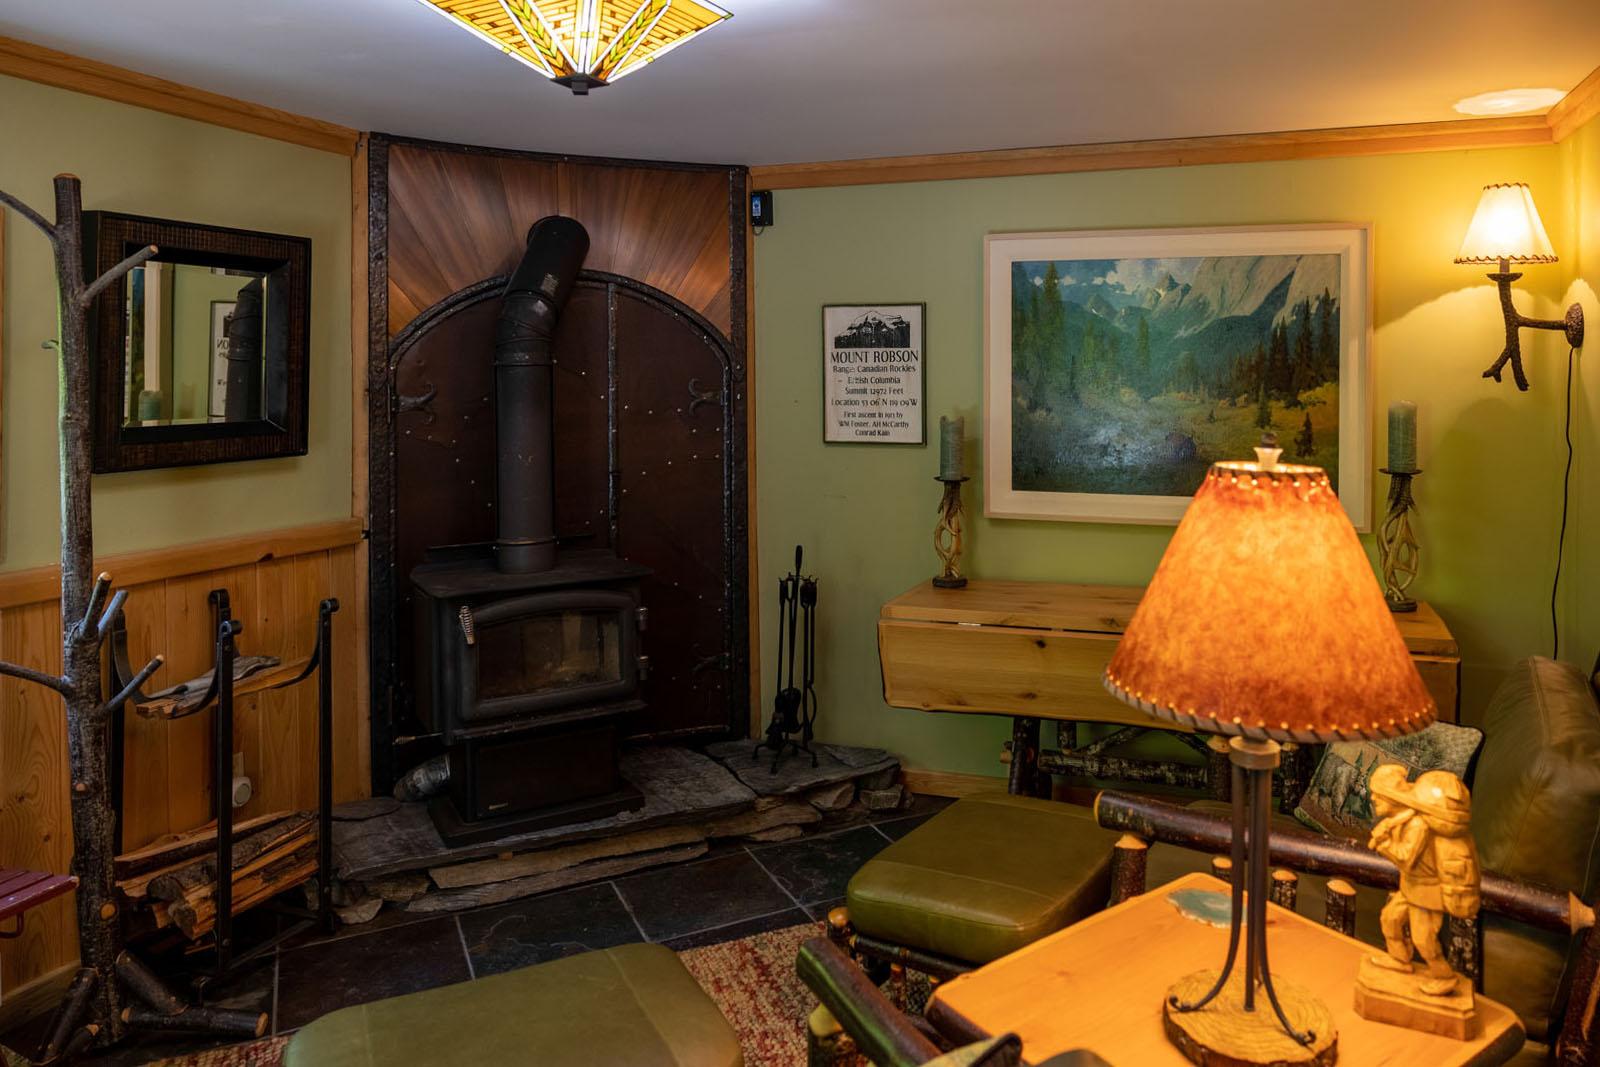 Mount robson log home 07